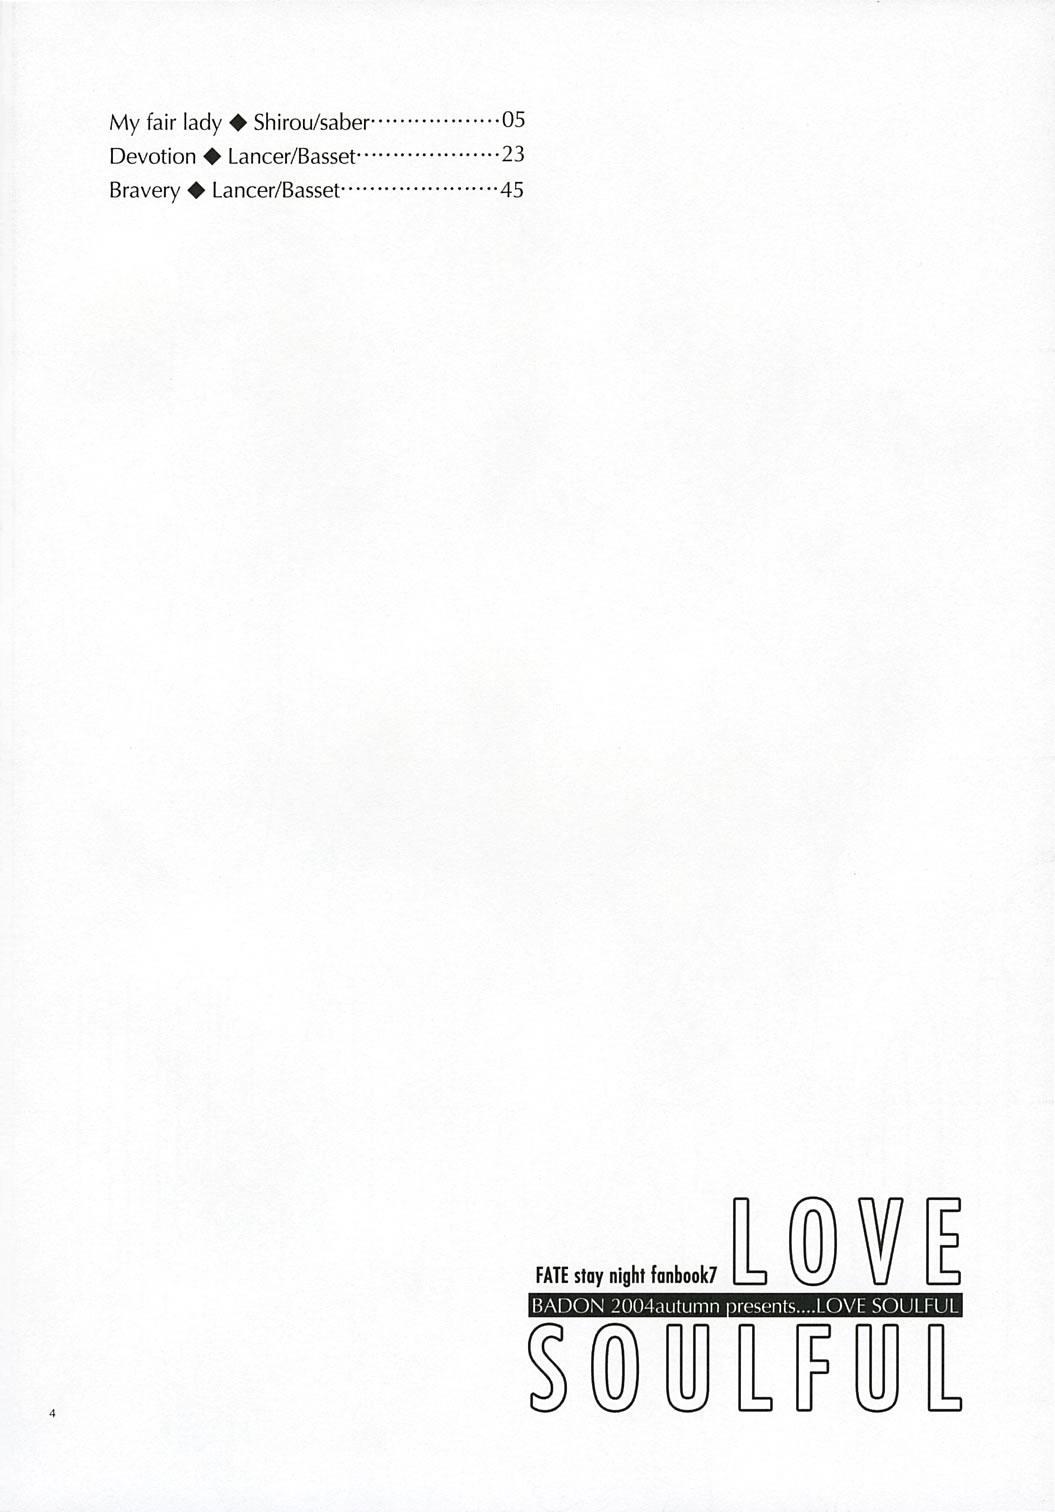 Love Soulful 2